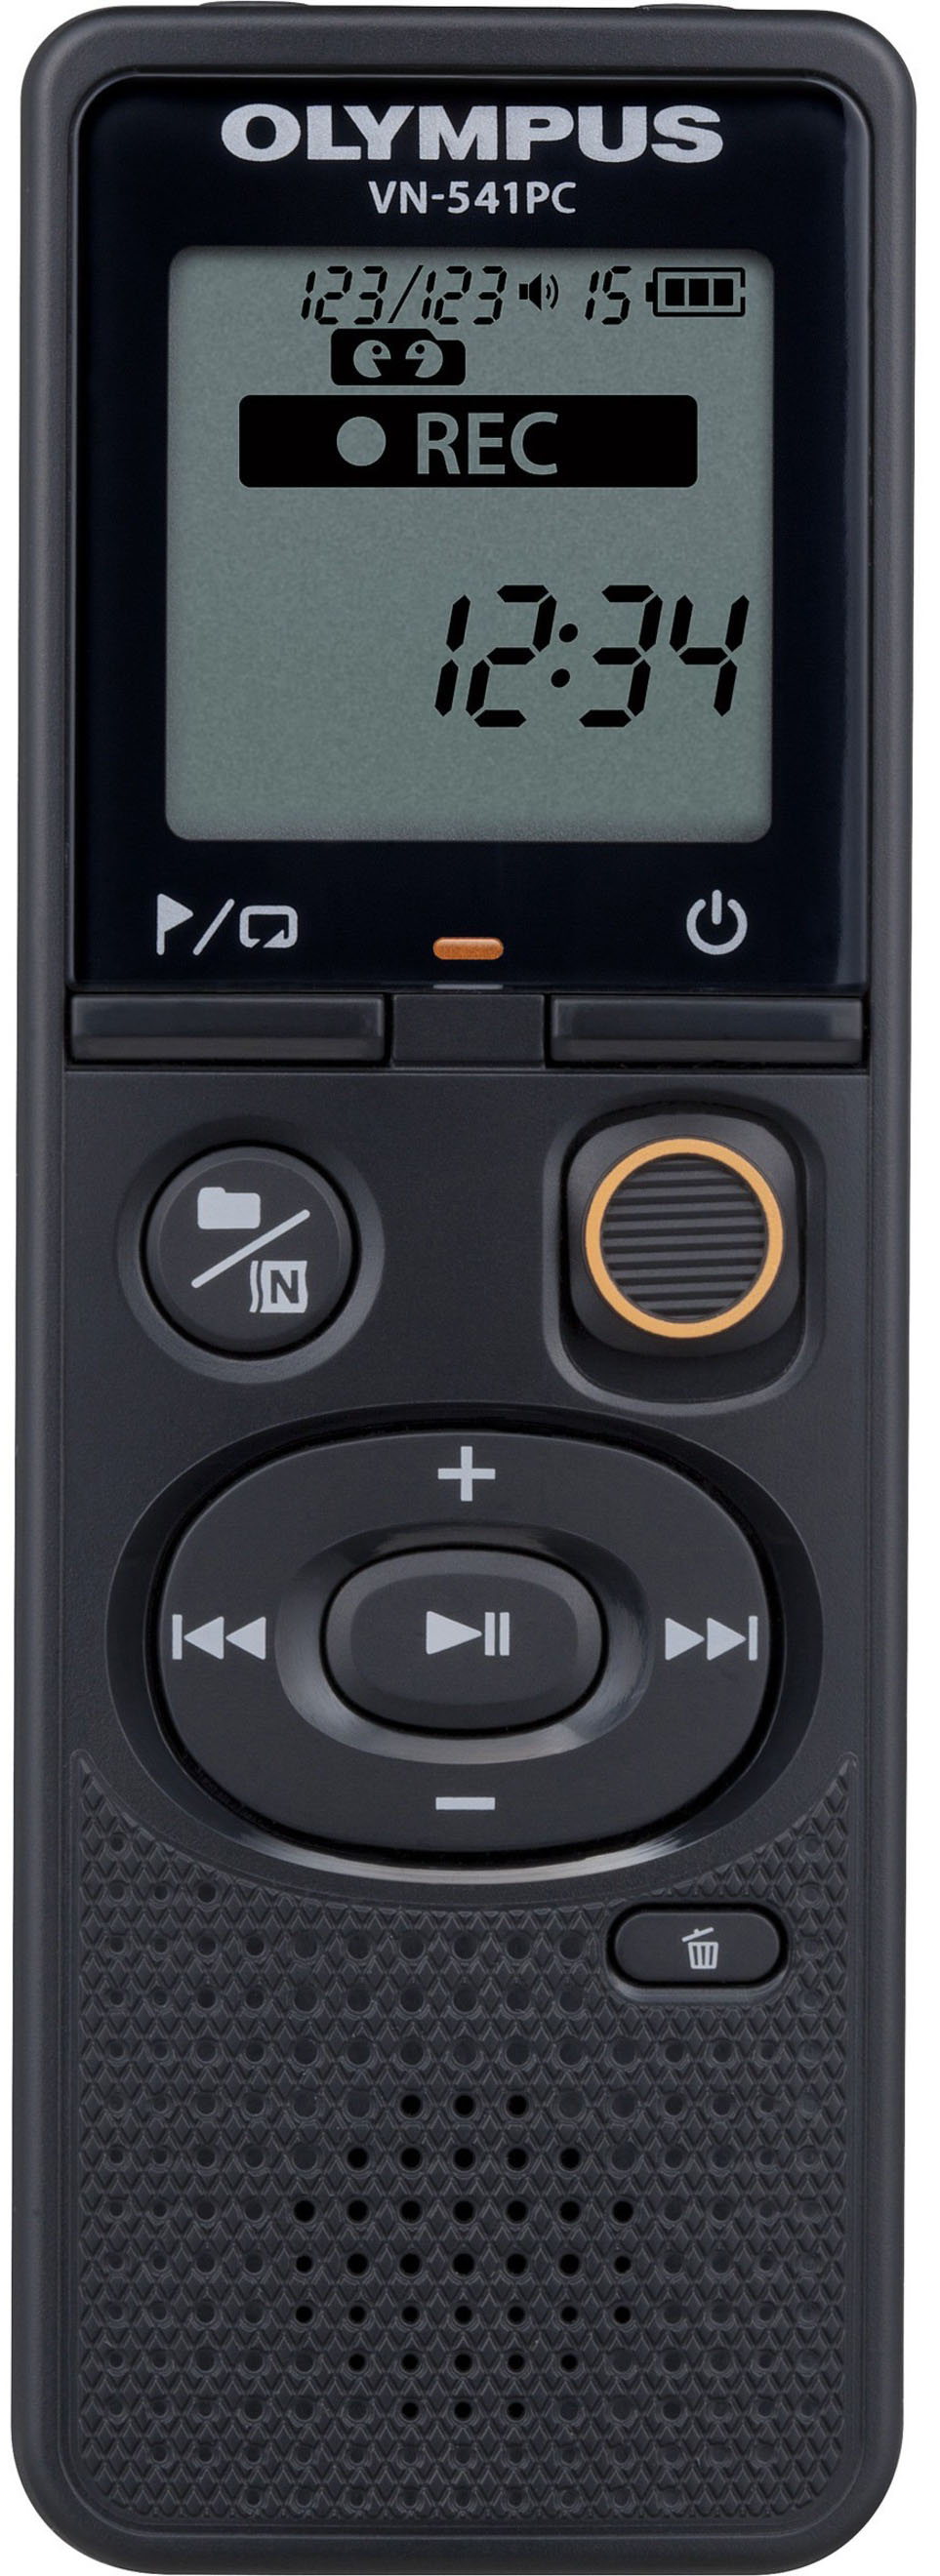 Olympus - VN-Series Digital Voice Recorder - Black - Front Zoom